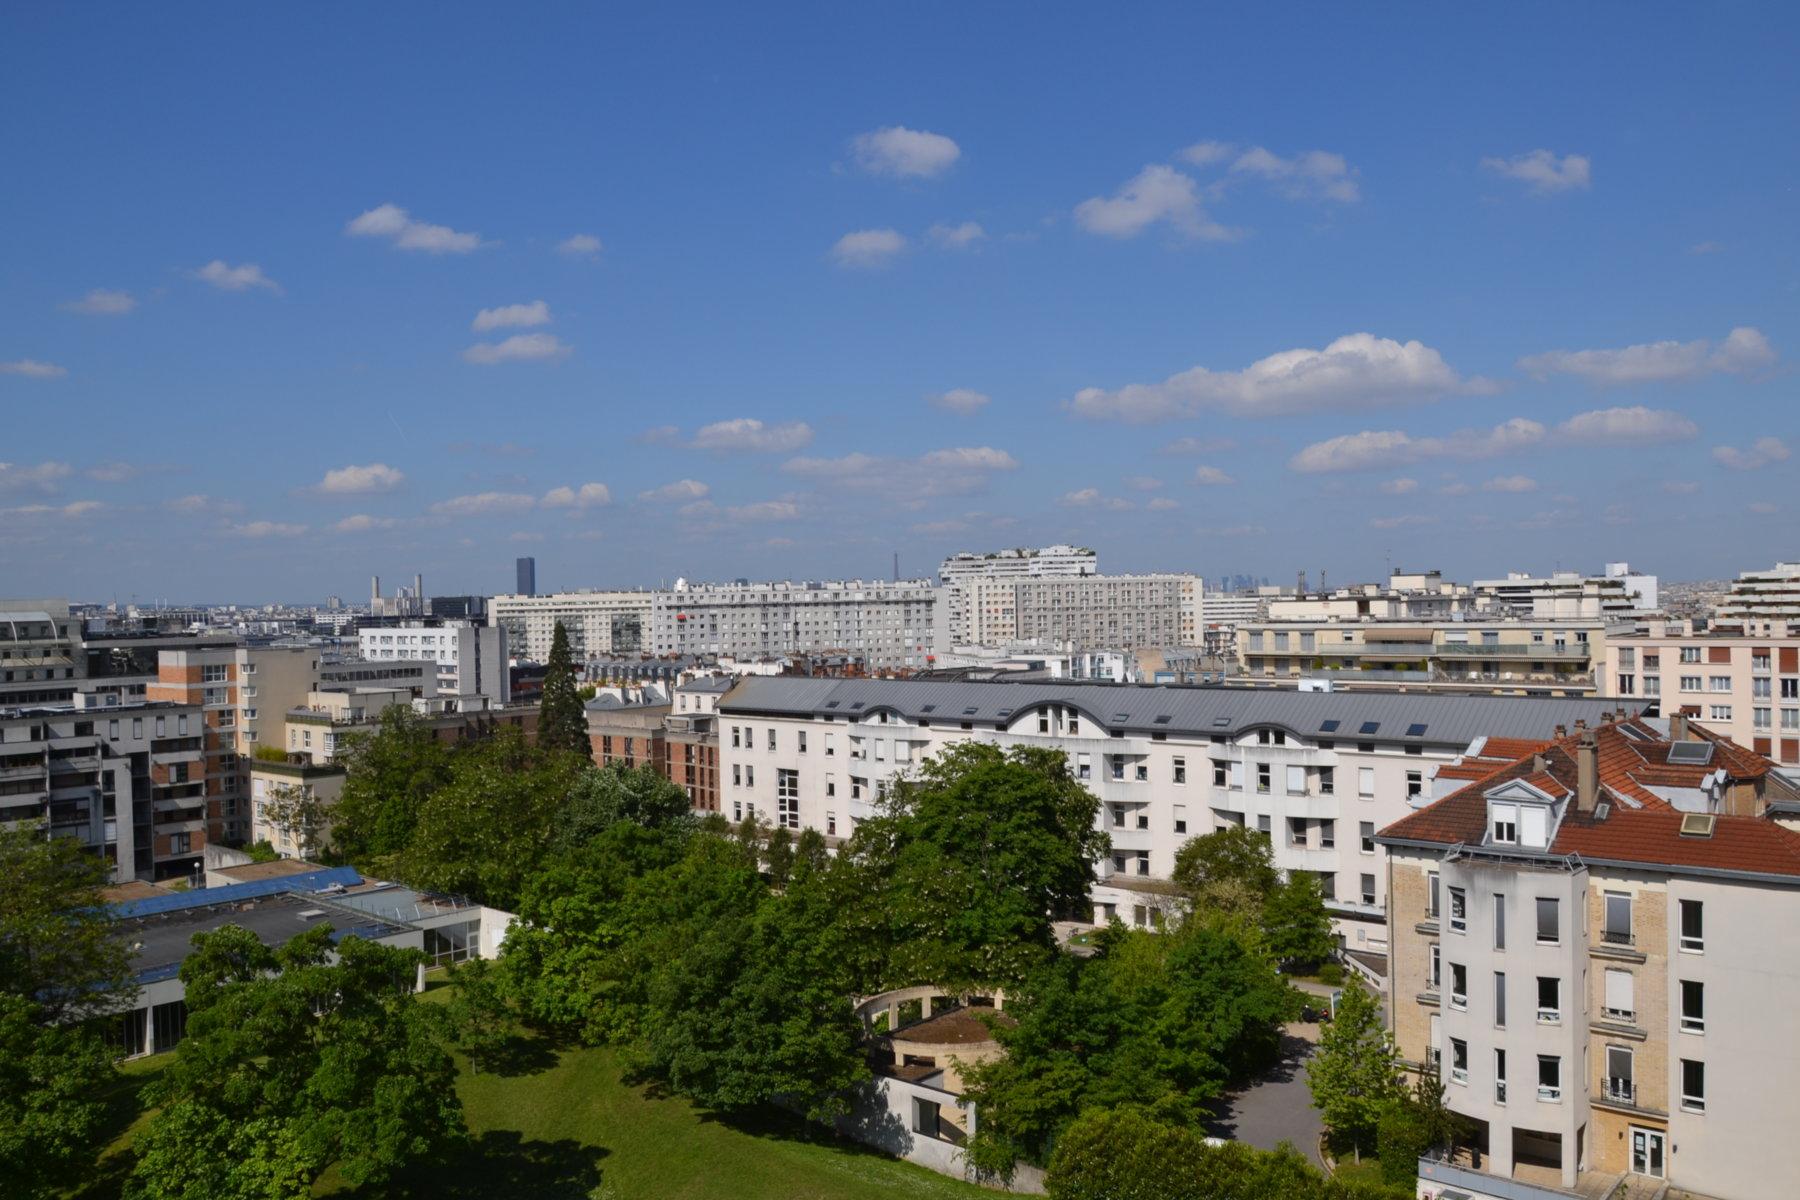 36 rue de picpus 75012 paris foncier nation orpi for Biens atypiques paris